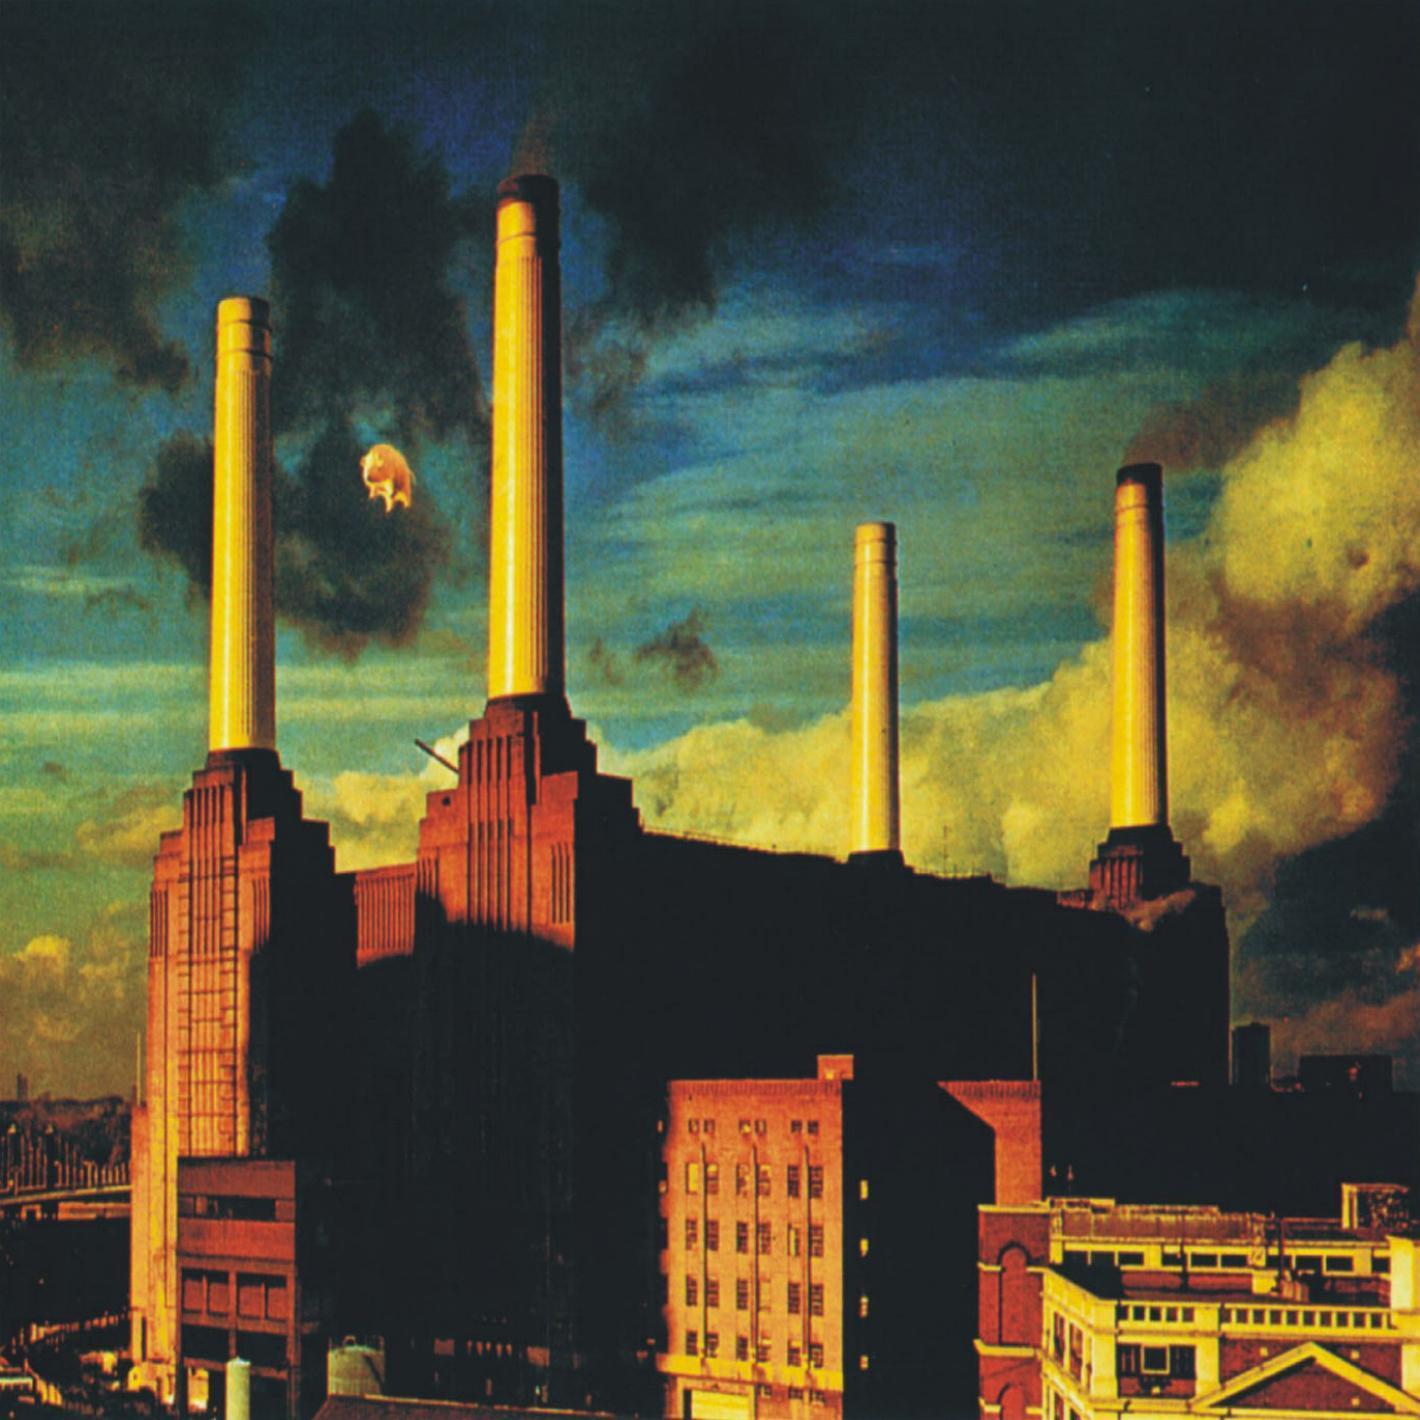 Pink Floyd Album Covers Wallpaper